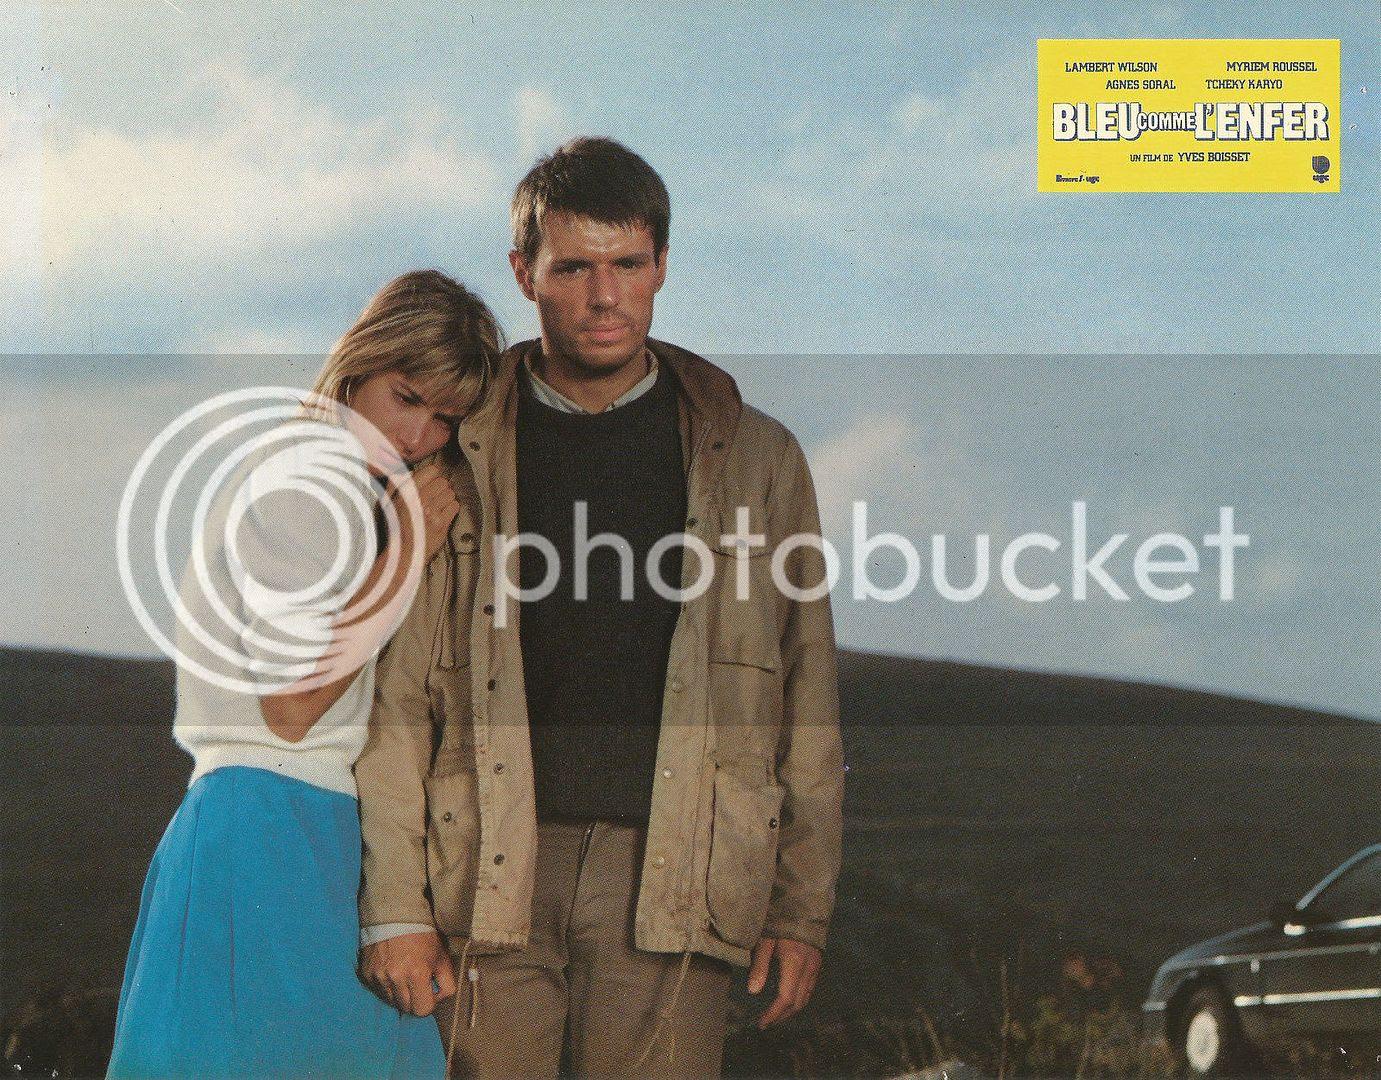 photo poster_bleu_enfer-3.jpg